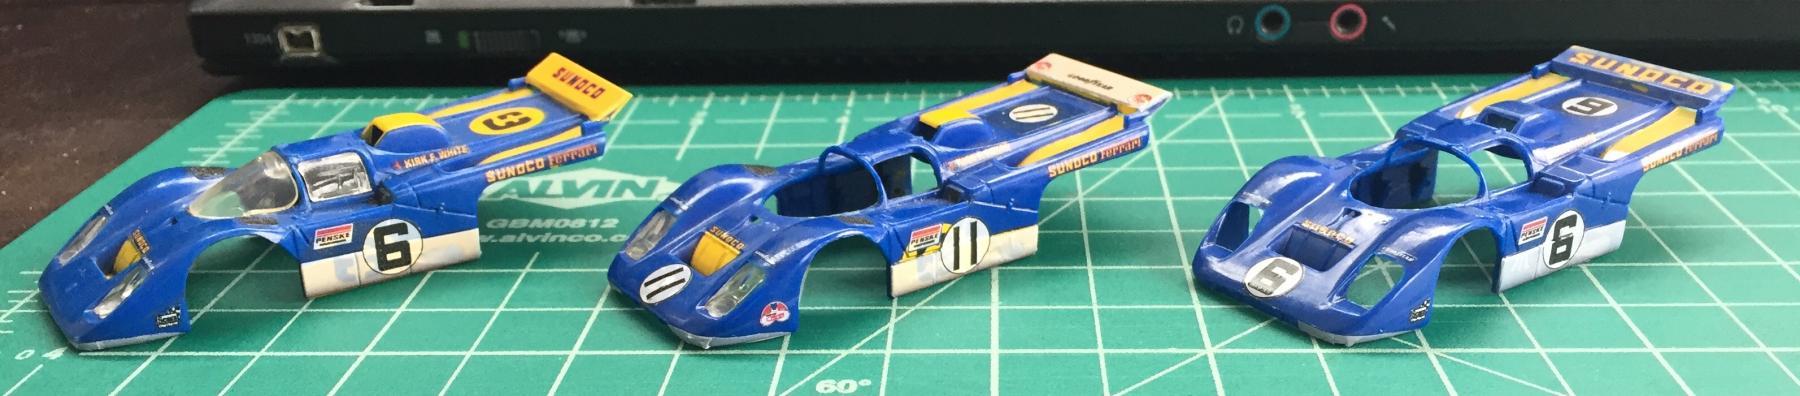 1971_Ferrari_512Ms_LF.jpg